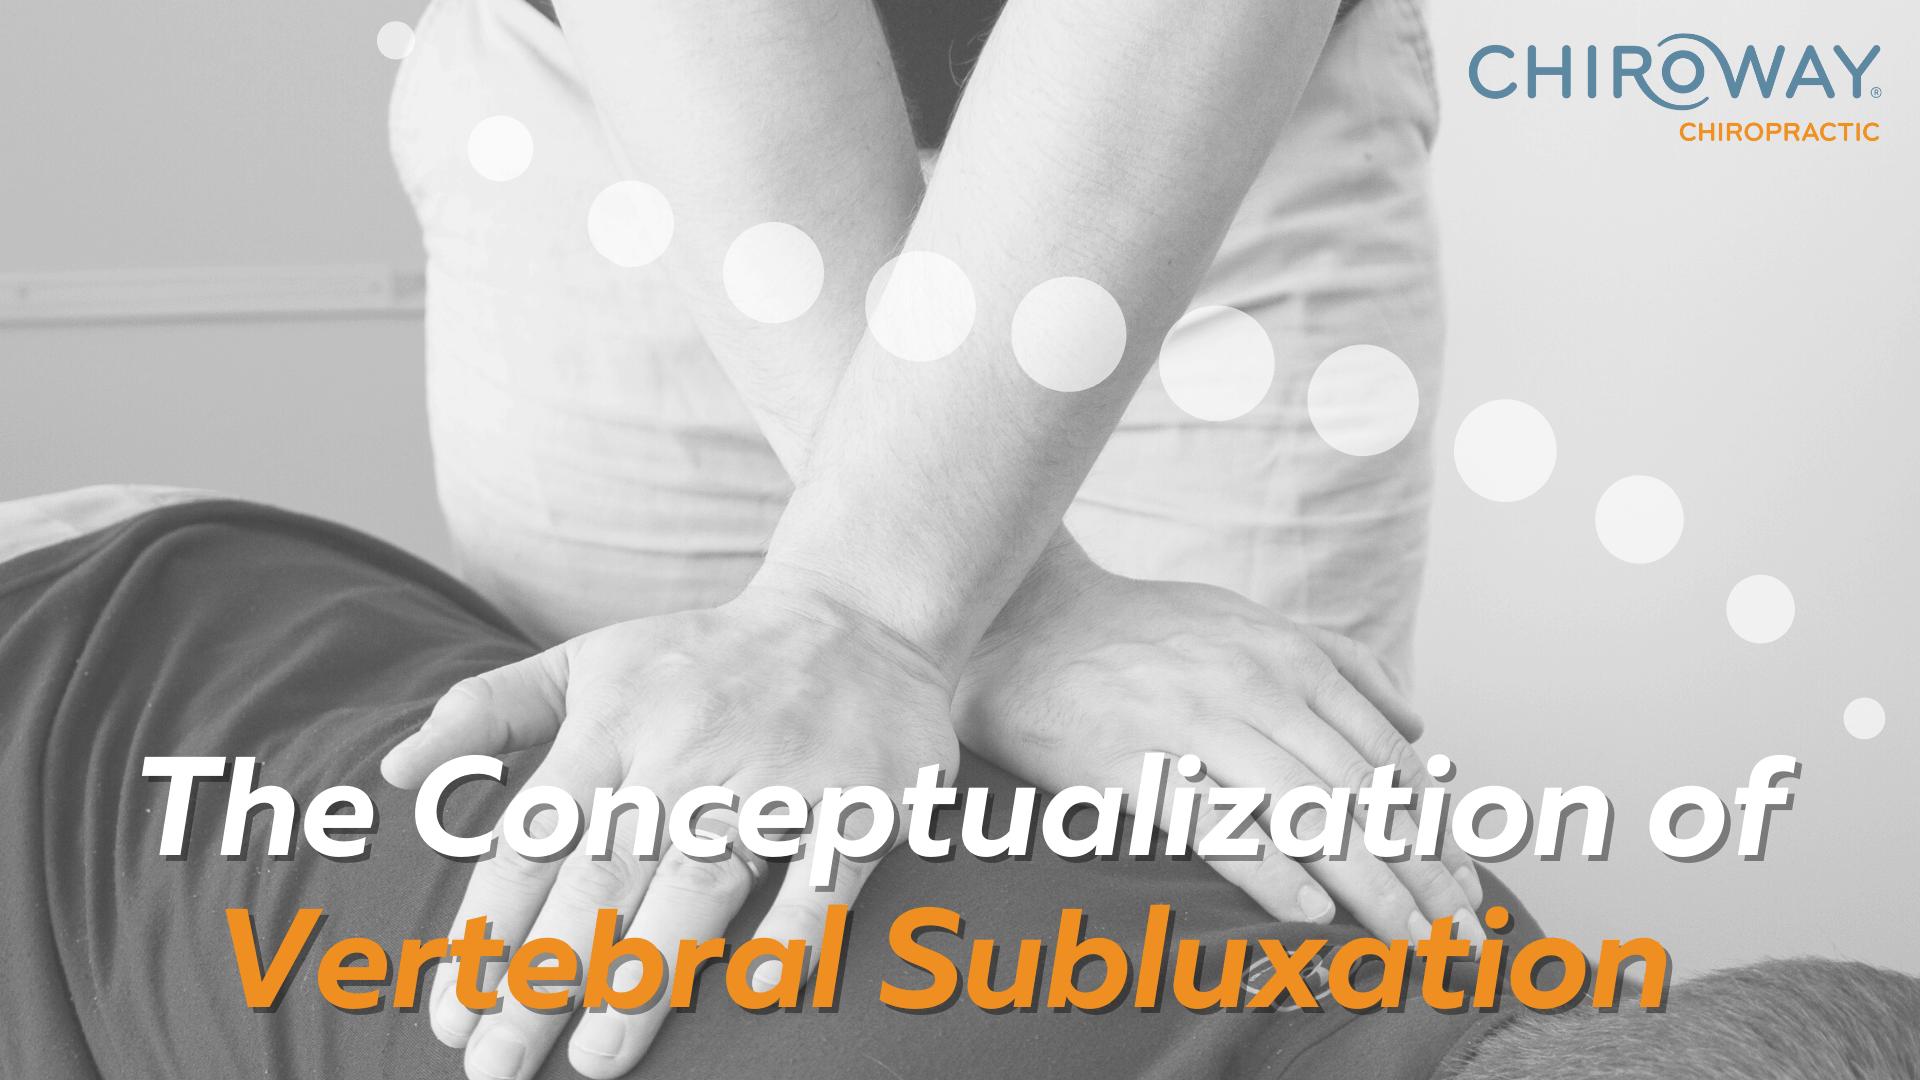 The Conceptualization of Vertebral Subluxation